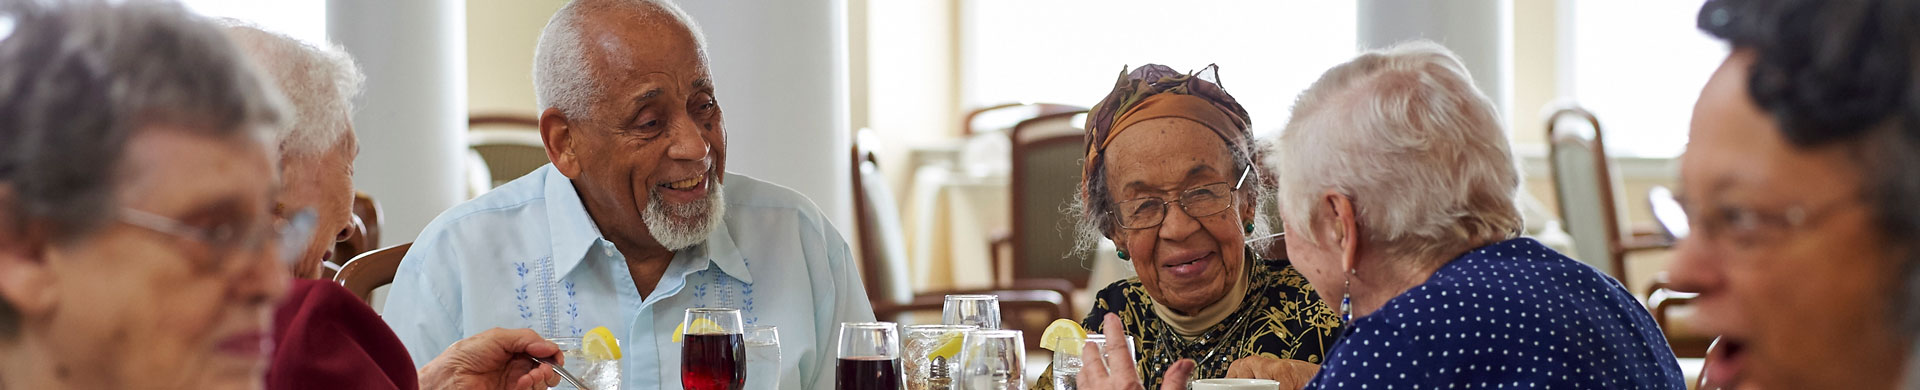 Dining Laurel Circle Retirement Community